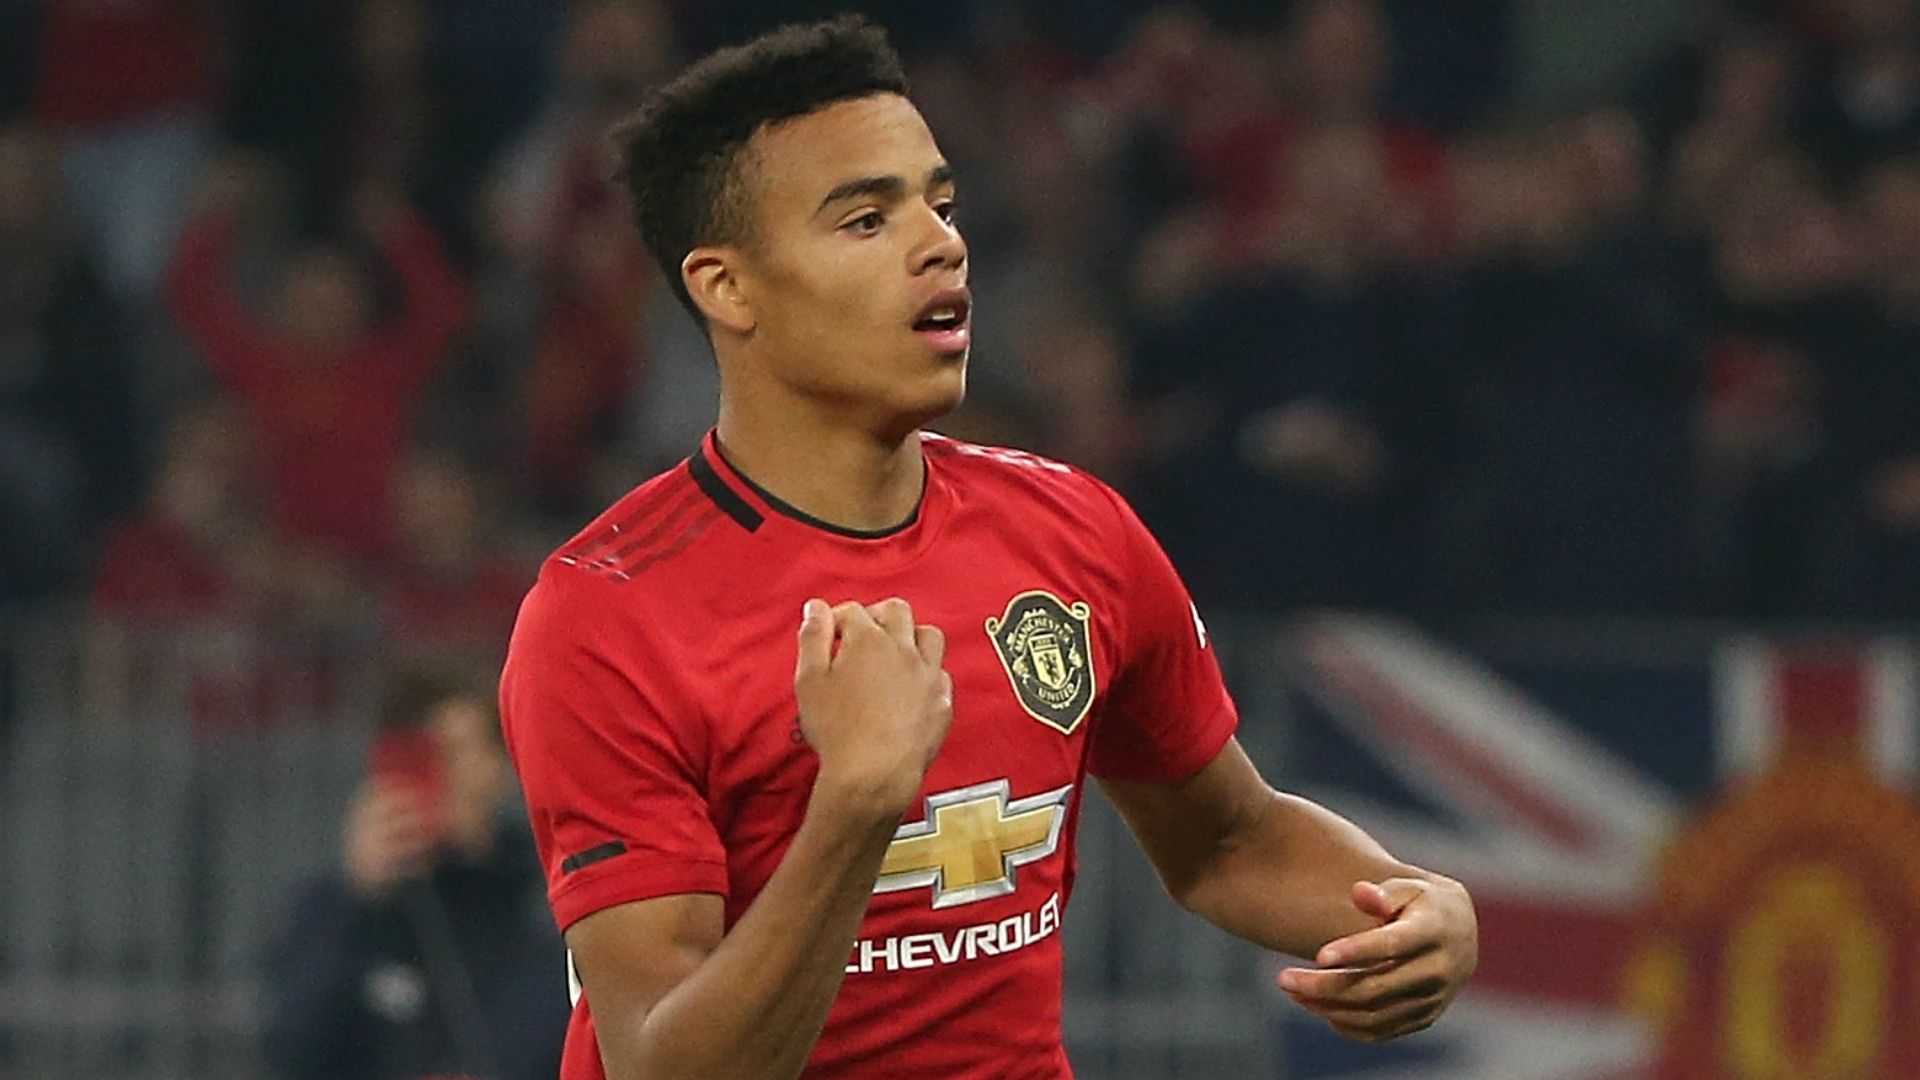 Greenwood could start Man United's Premier League opener against Chelsea, says Solskjaer